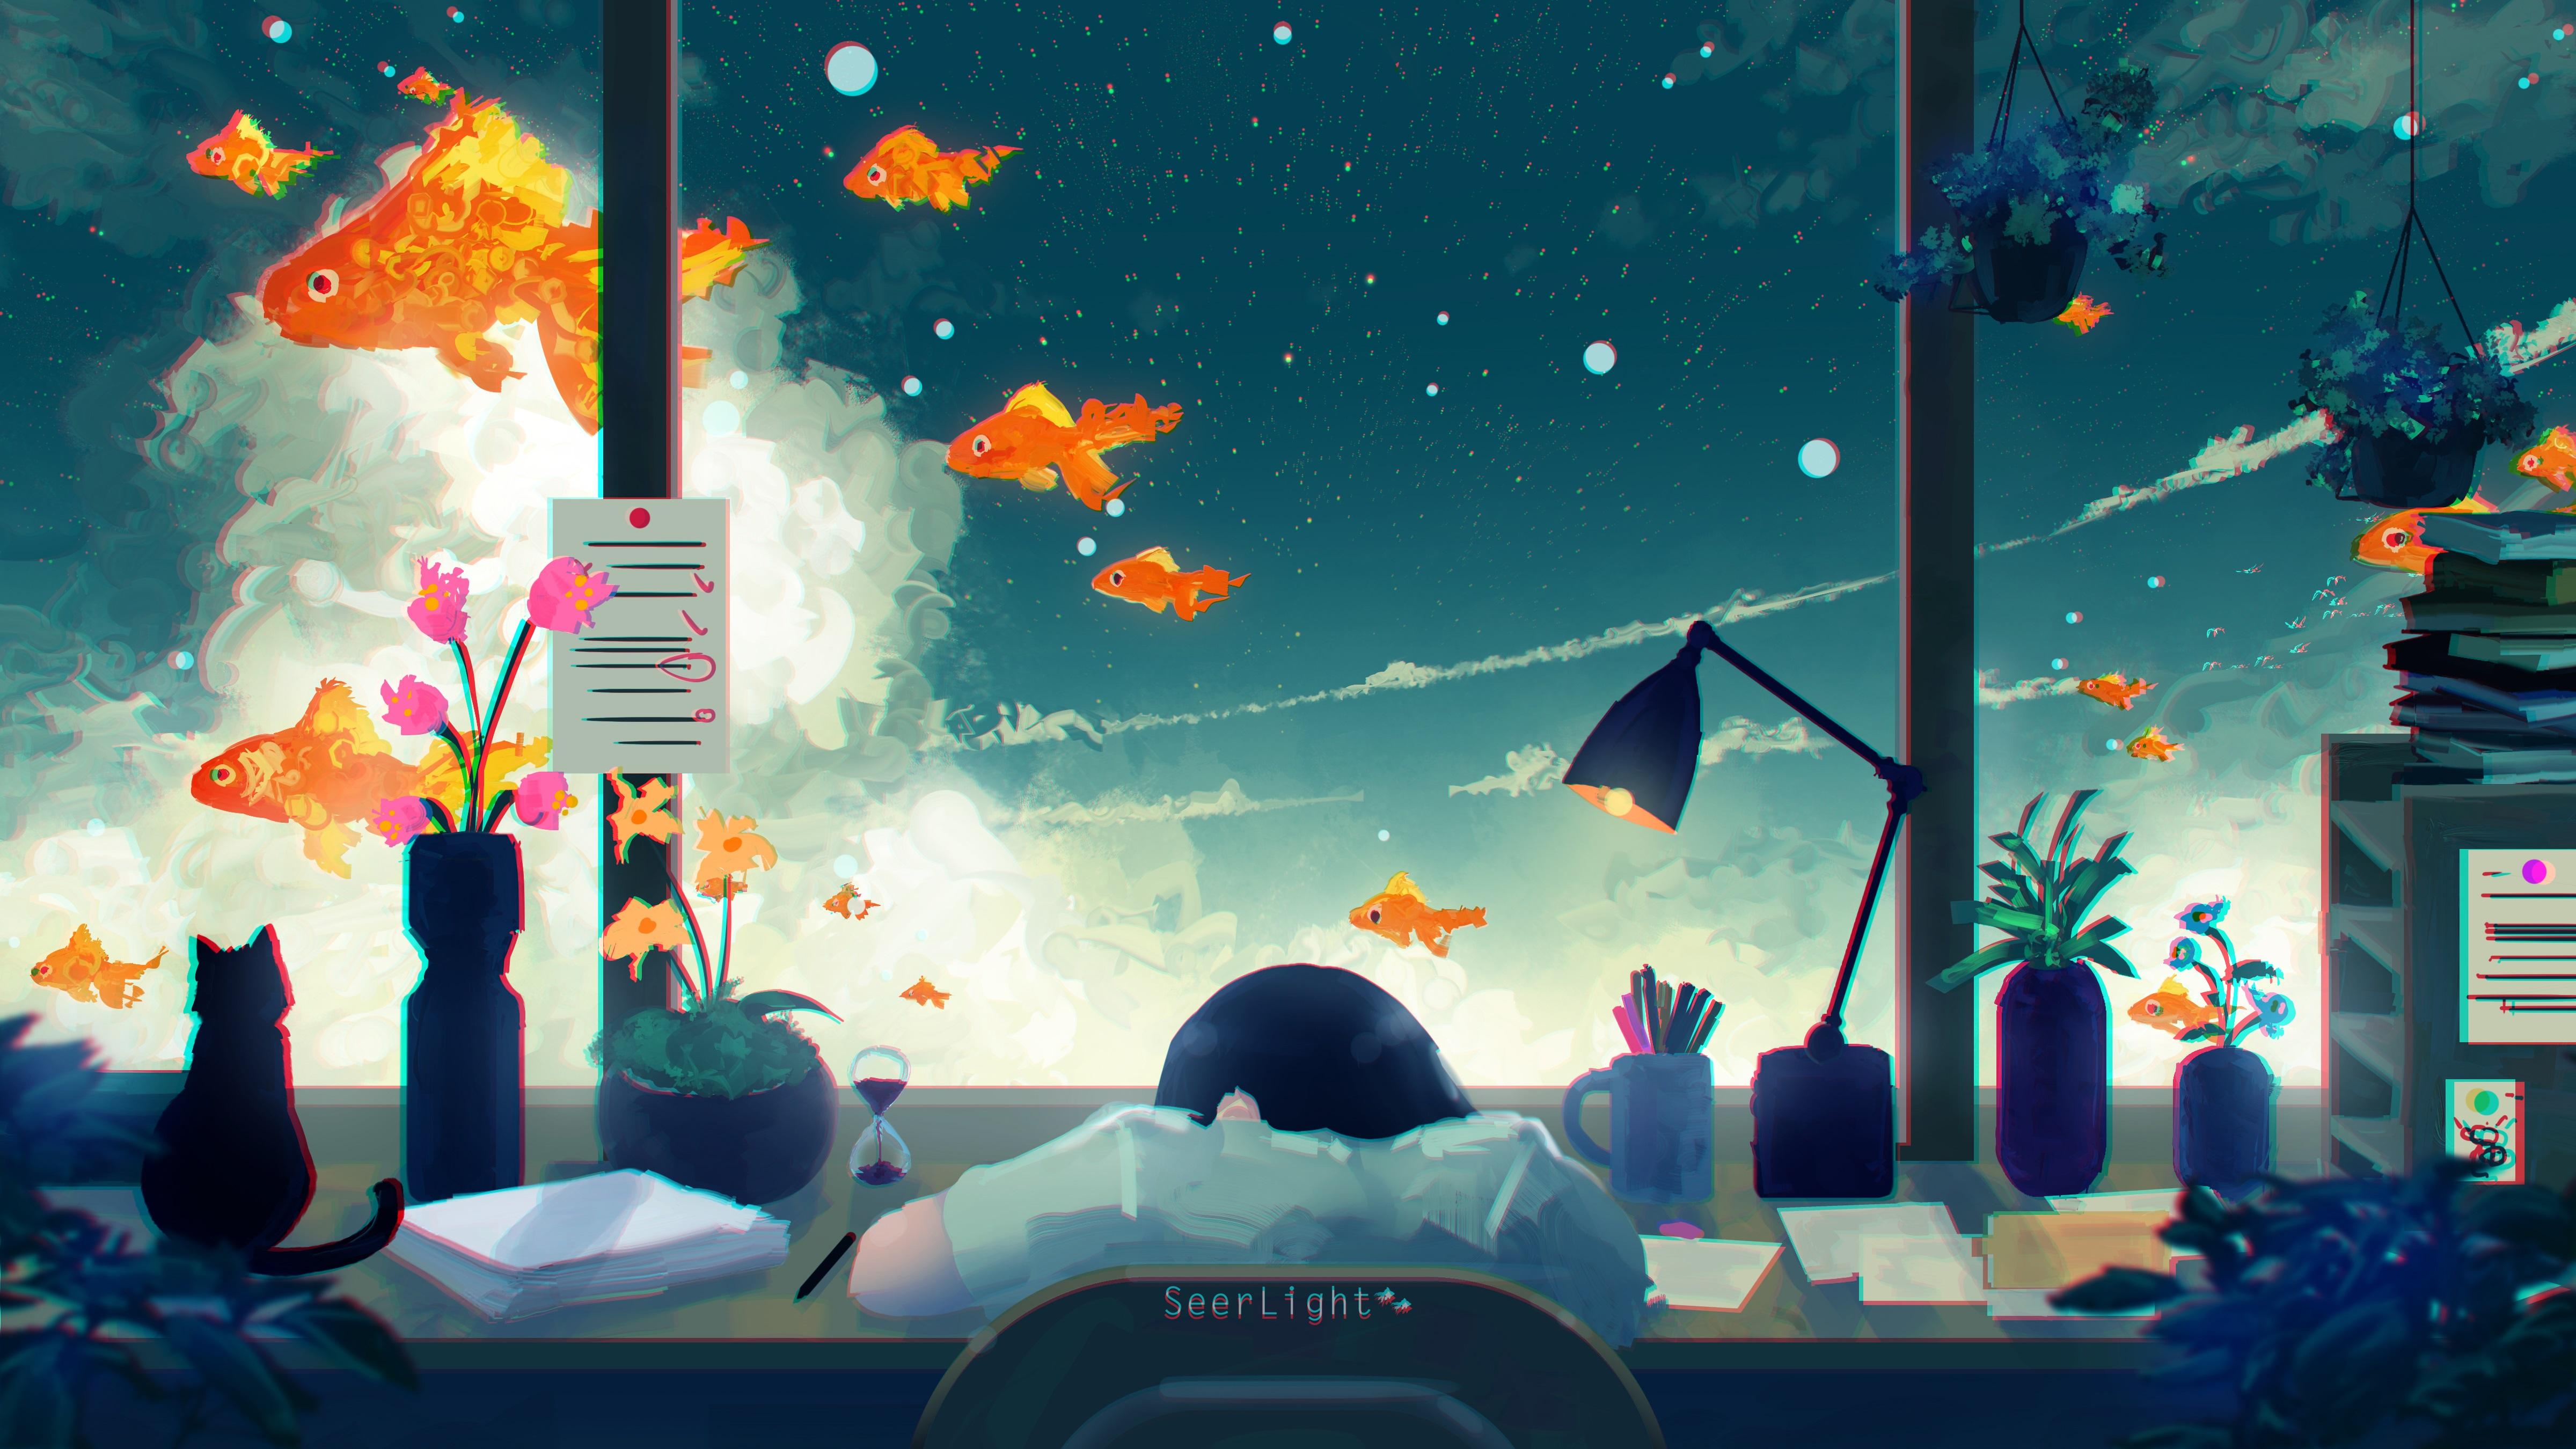 Anime Digital Art Wallpaper Hd